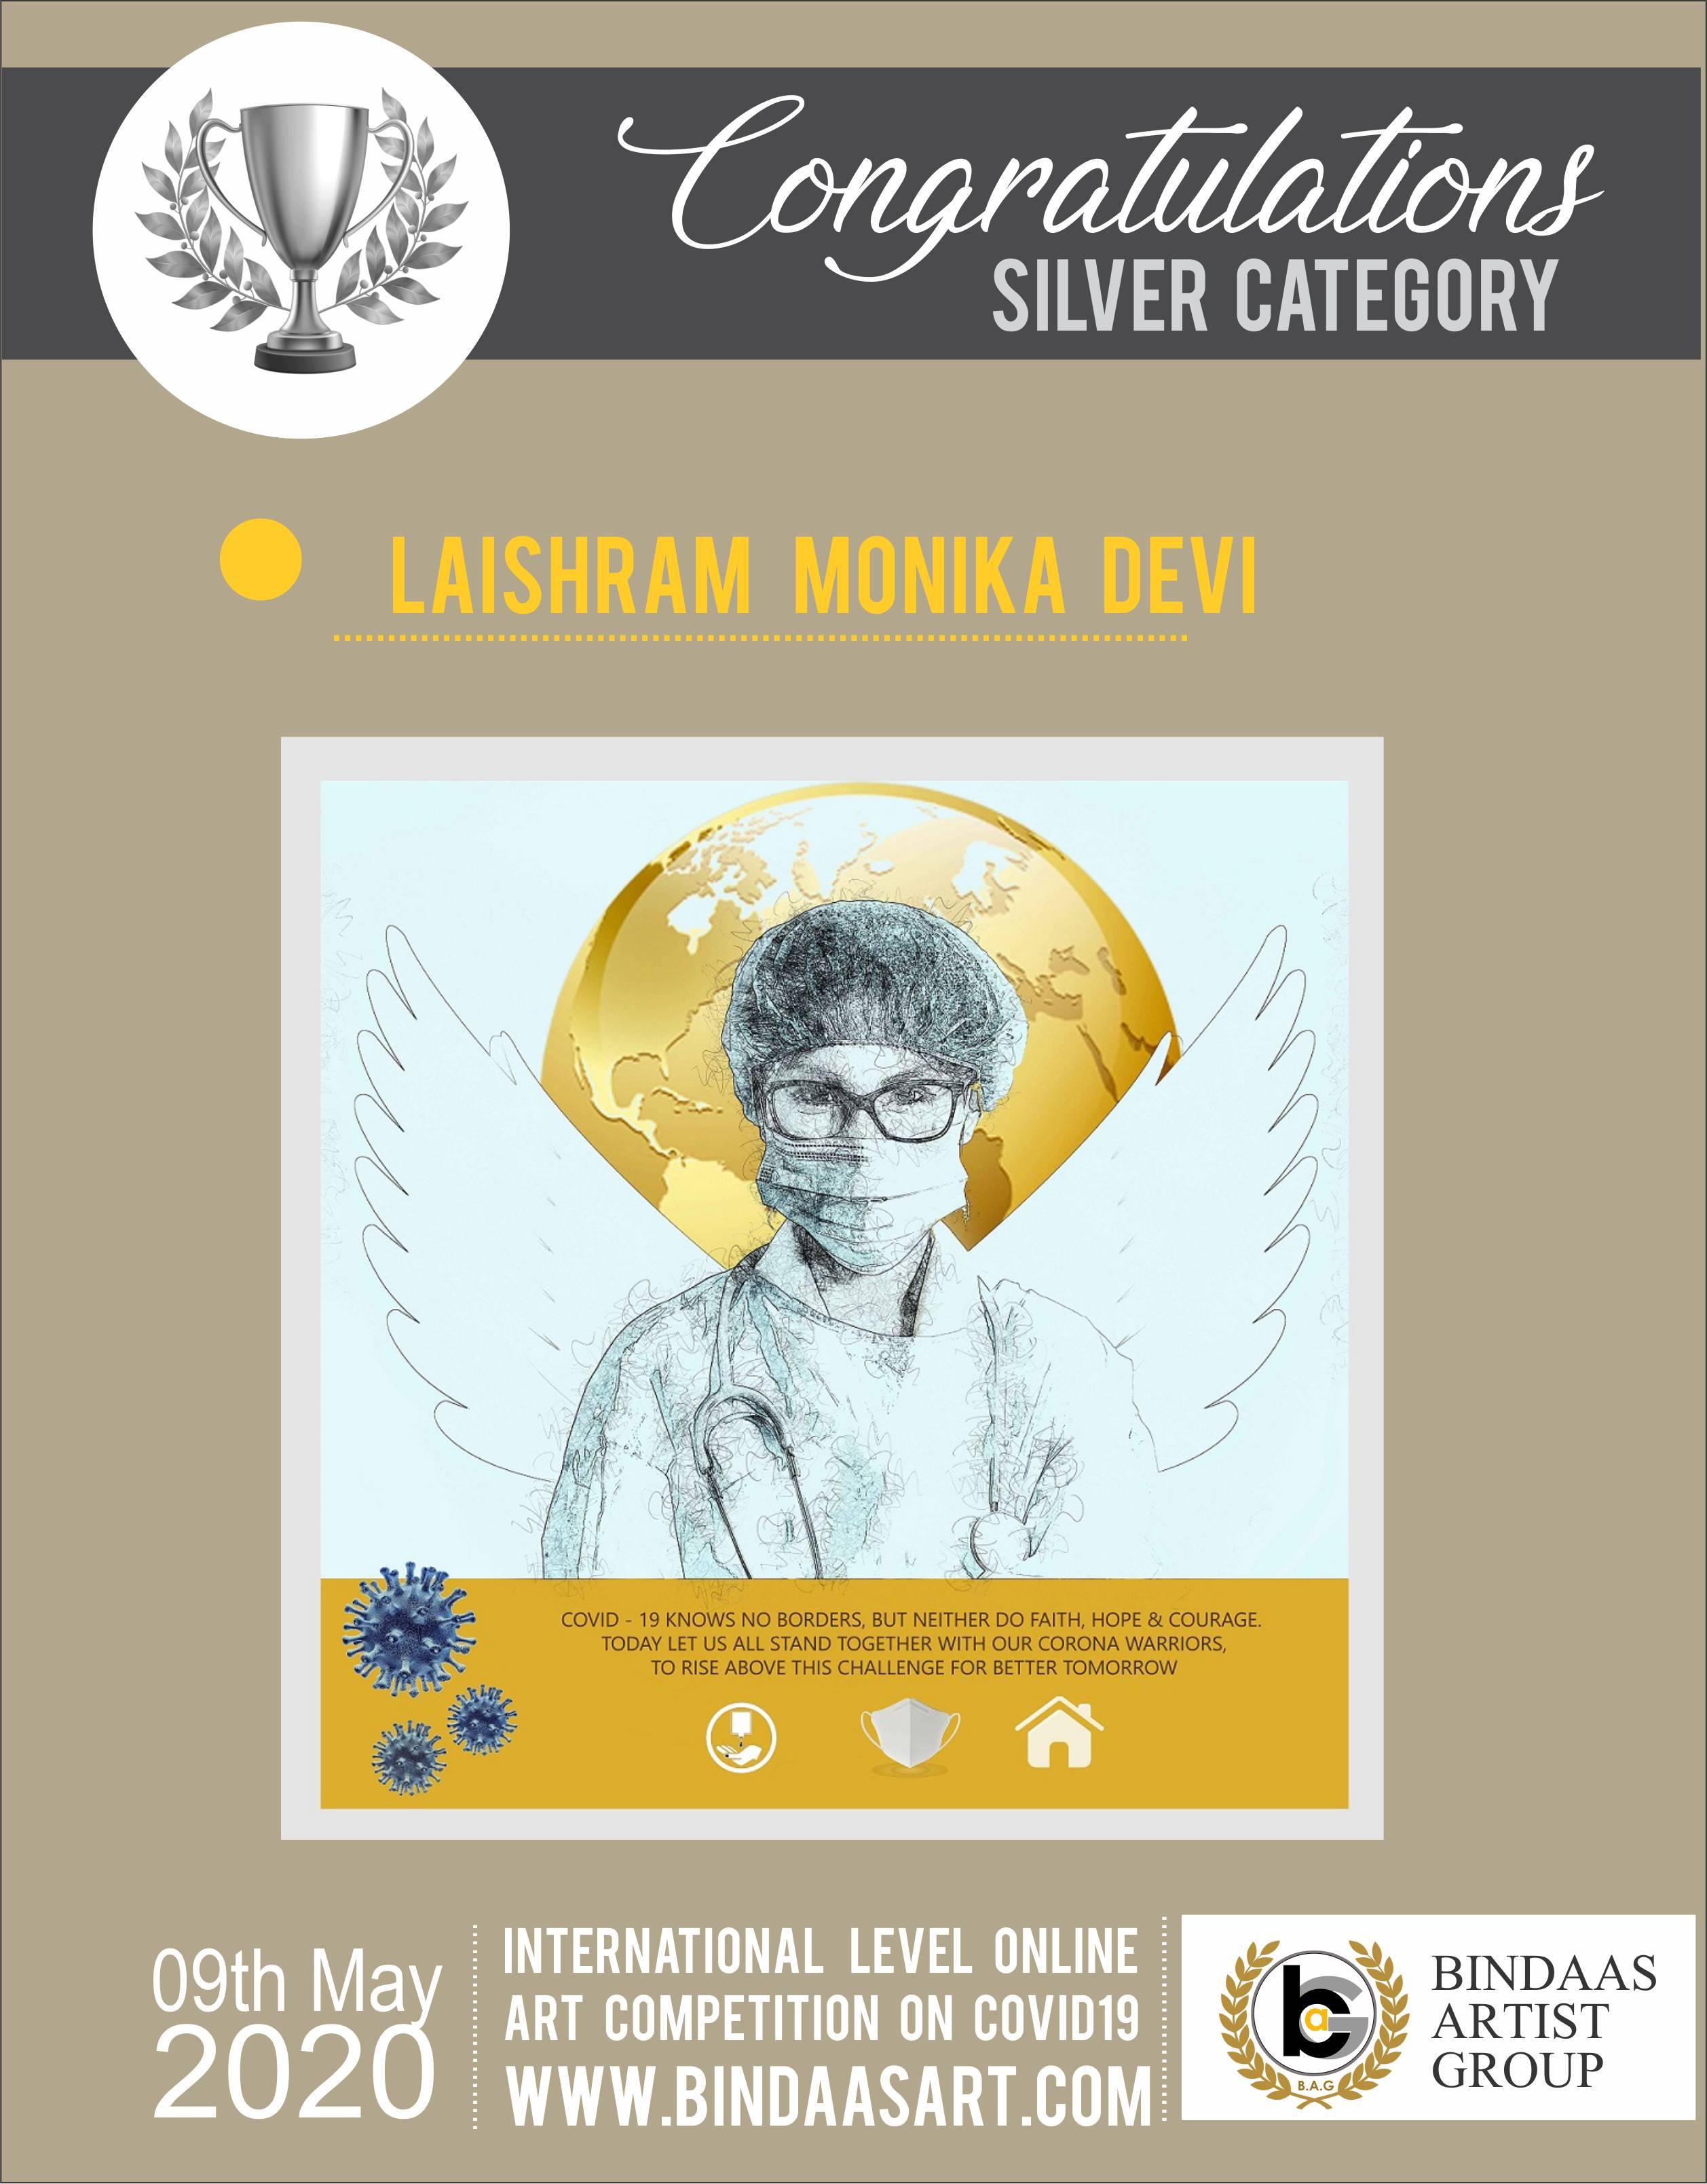 Laishram Monika devi